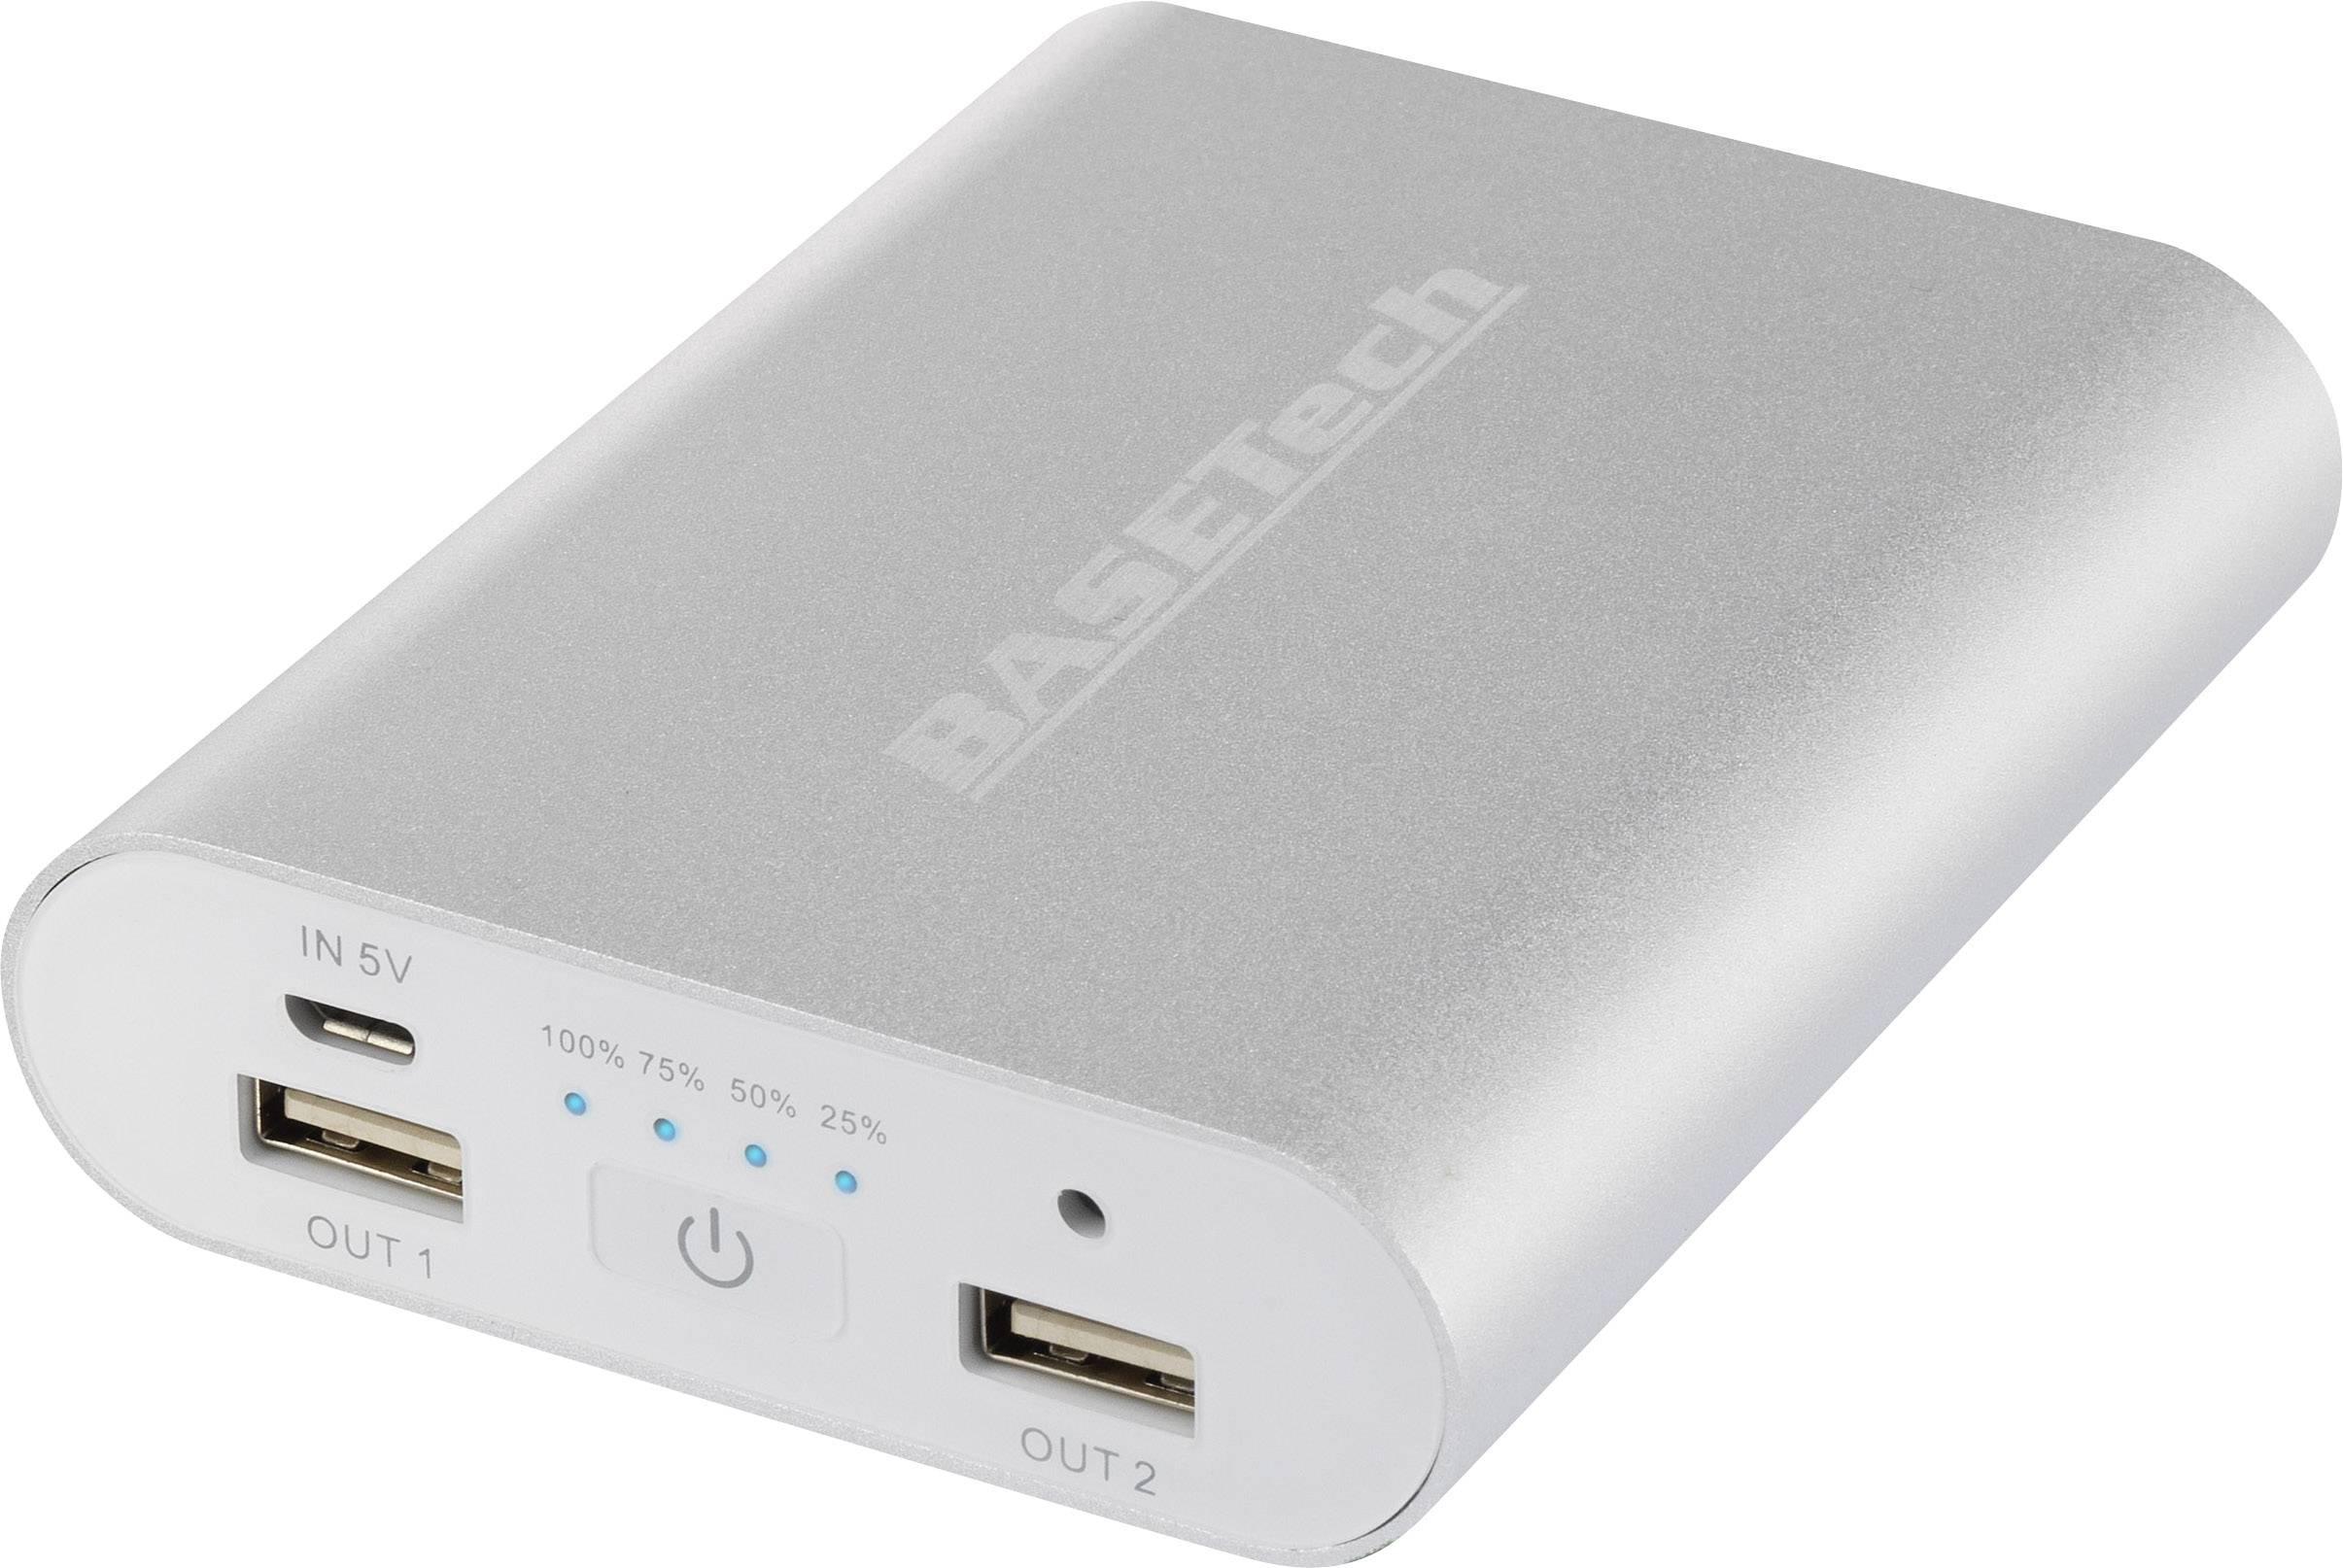 Powerbanka Basetech BTP-3, Li-Ion akumulátor 10400 mAh, stříbrná/bílá